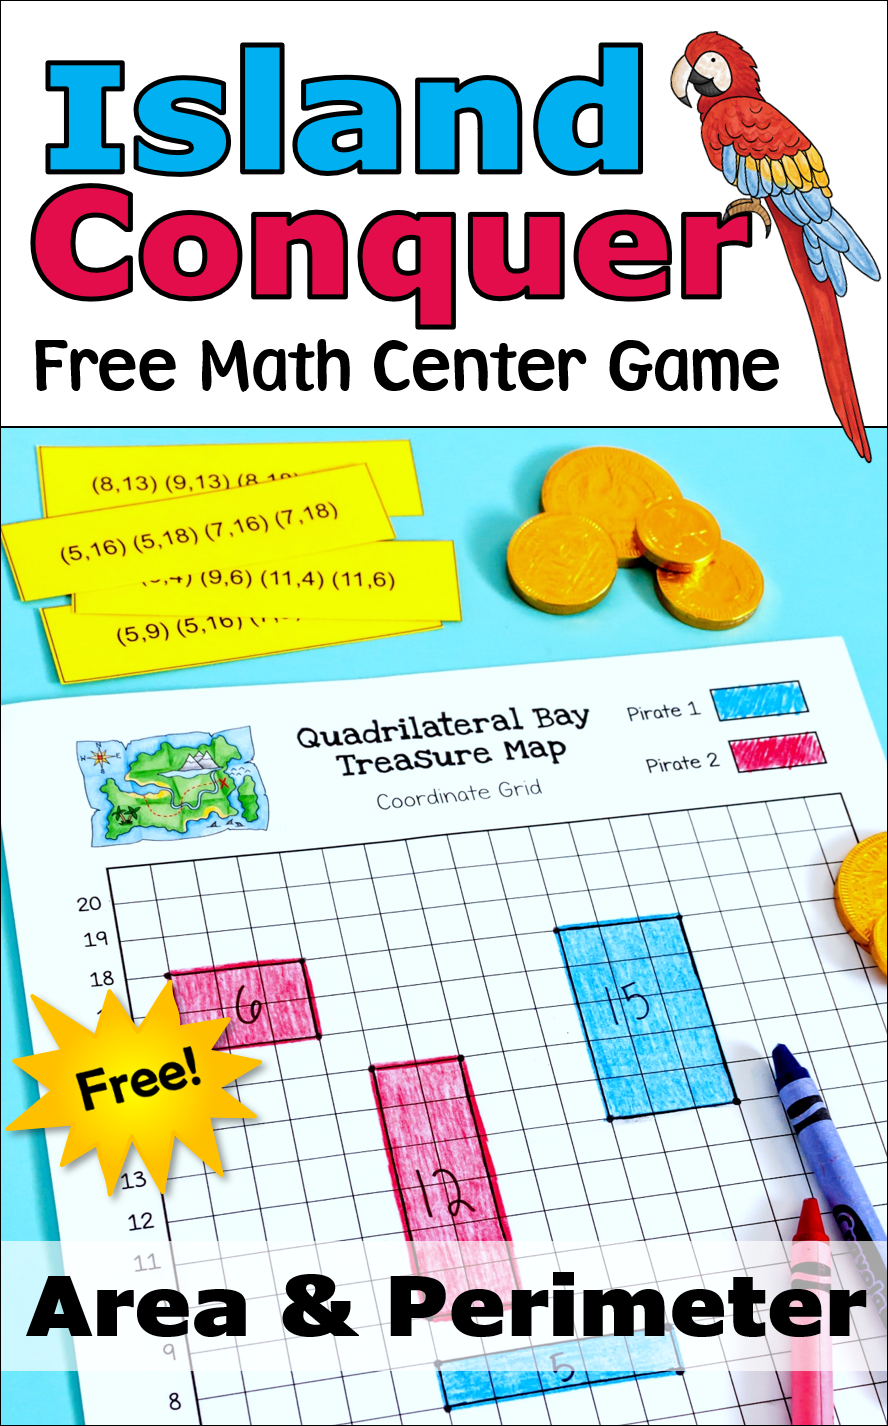 Island Conquer Free Pirate Themed Math Center Game Math Center Games Area Math Games Fun Math Activities [ 1426 x 888 Pixel ]